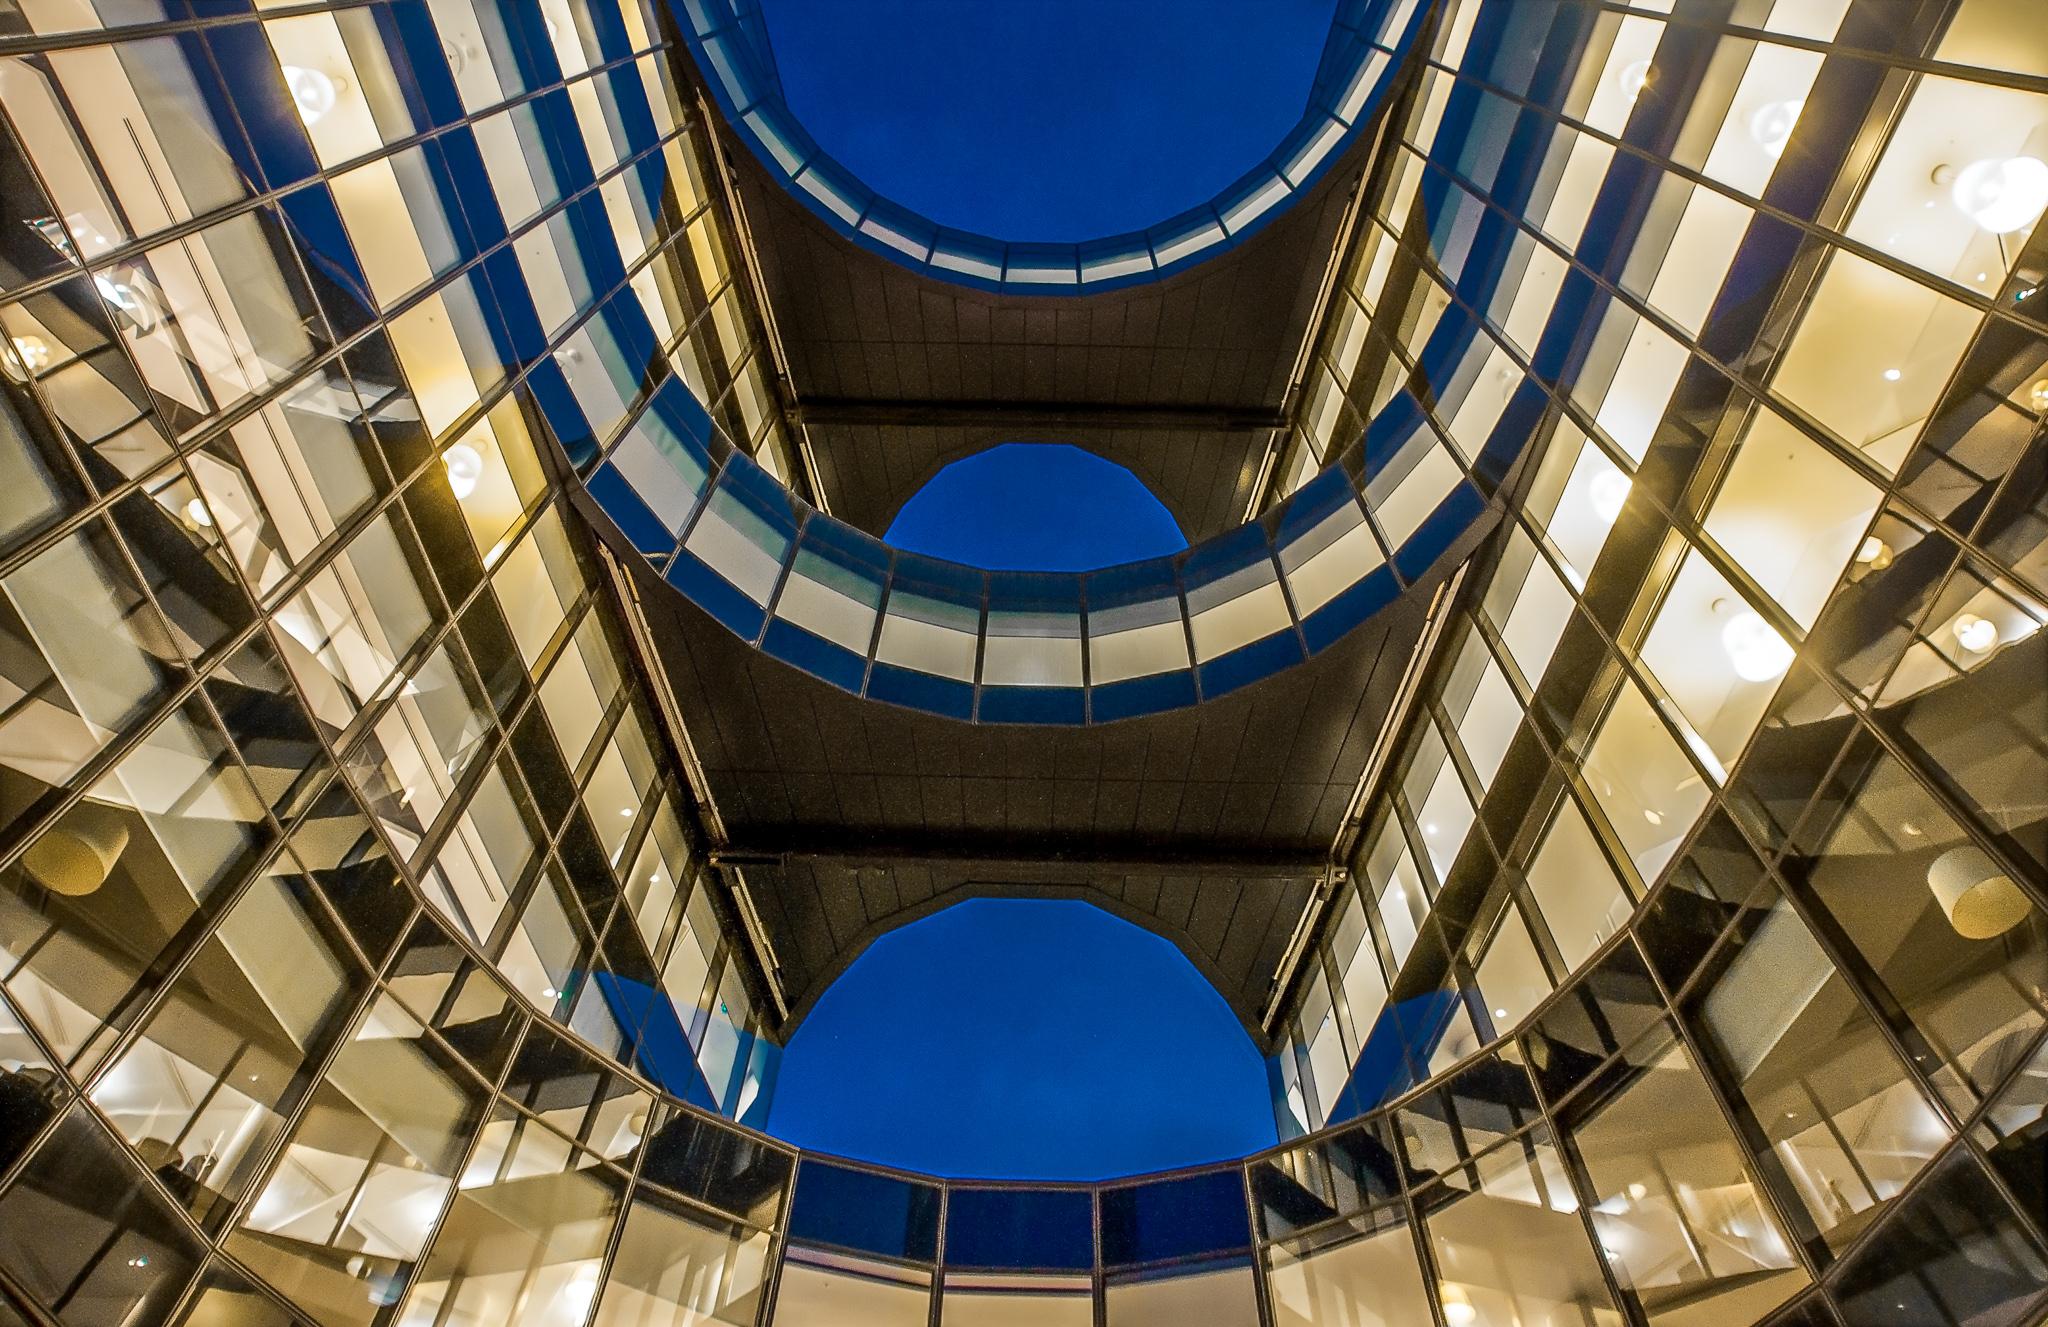 PwC Building, United Kingdom